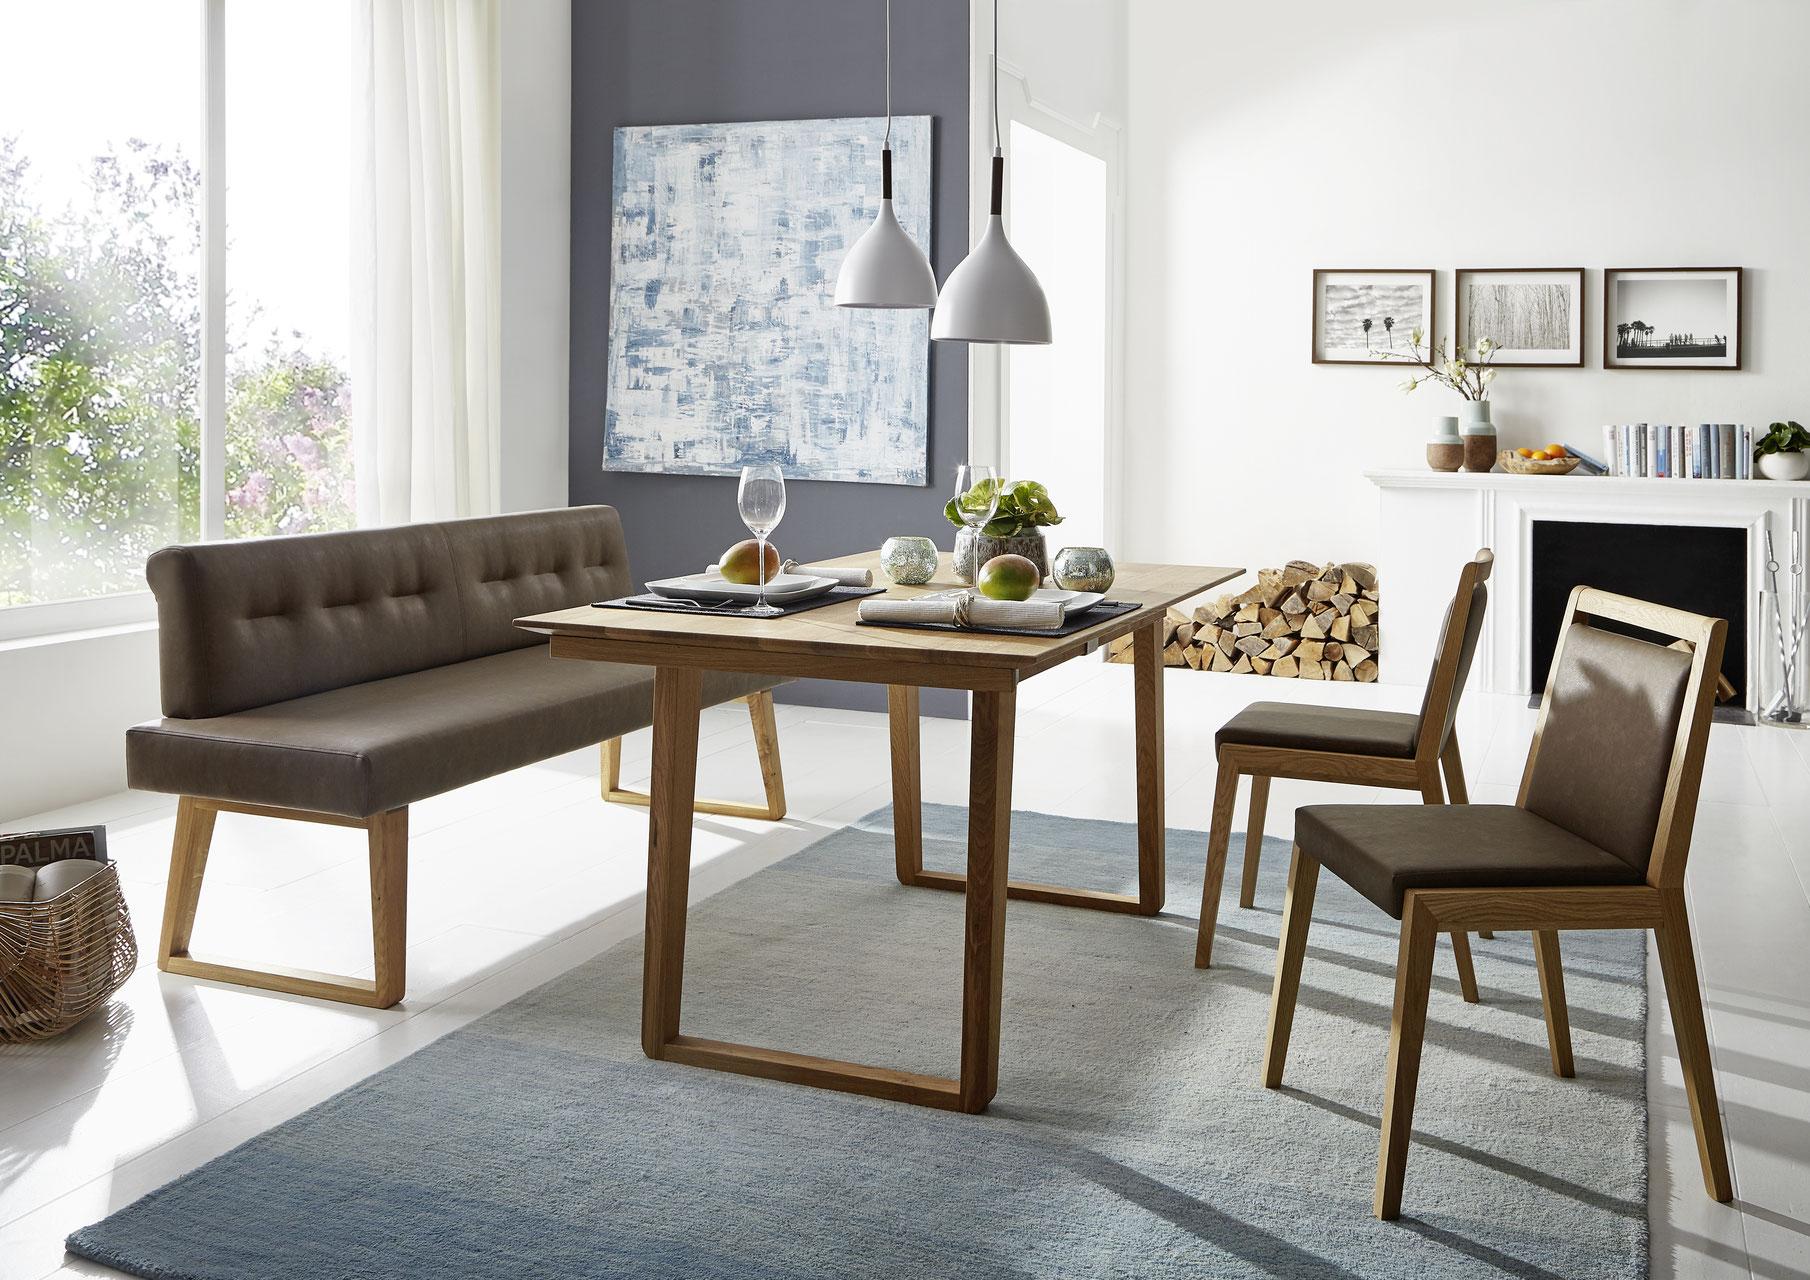 Exklusive Sitzbank aus leder und massivholz